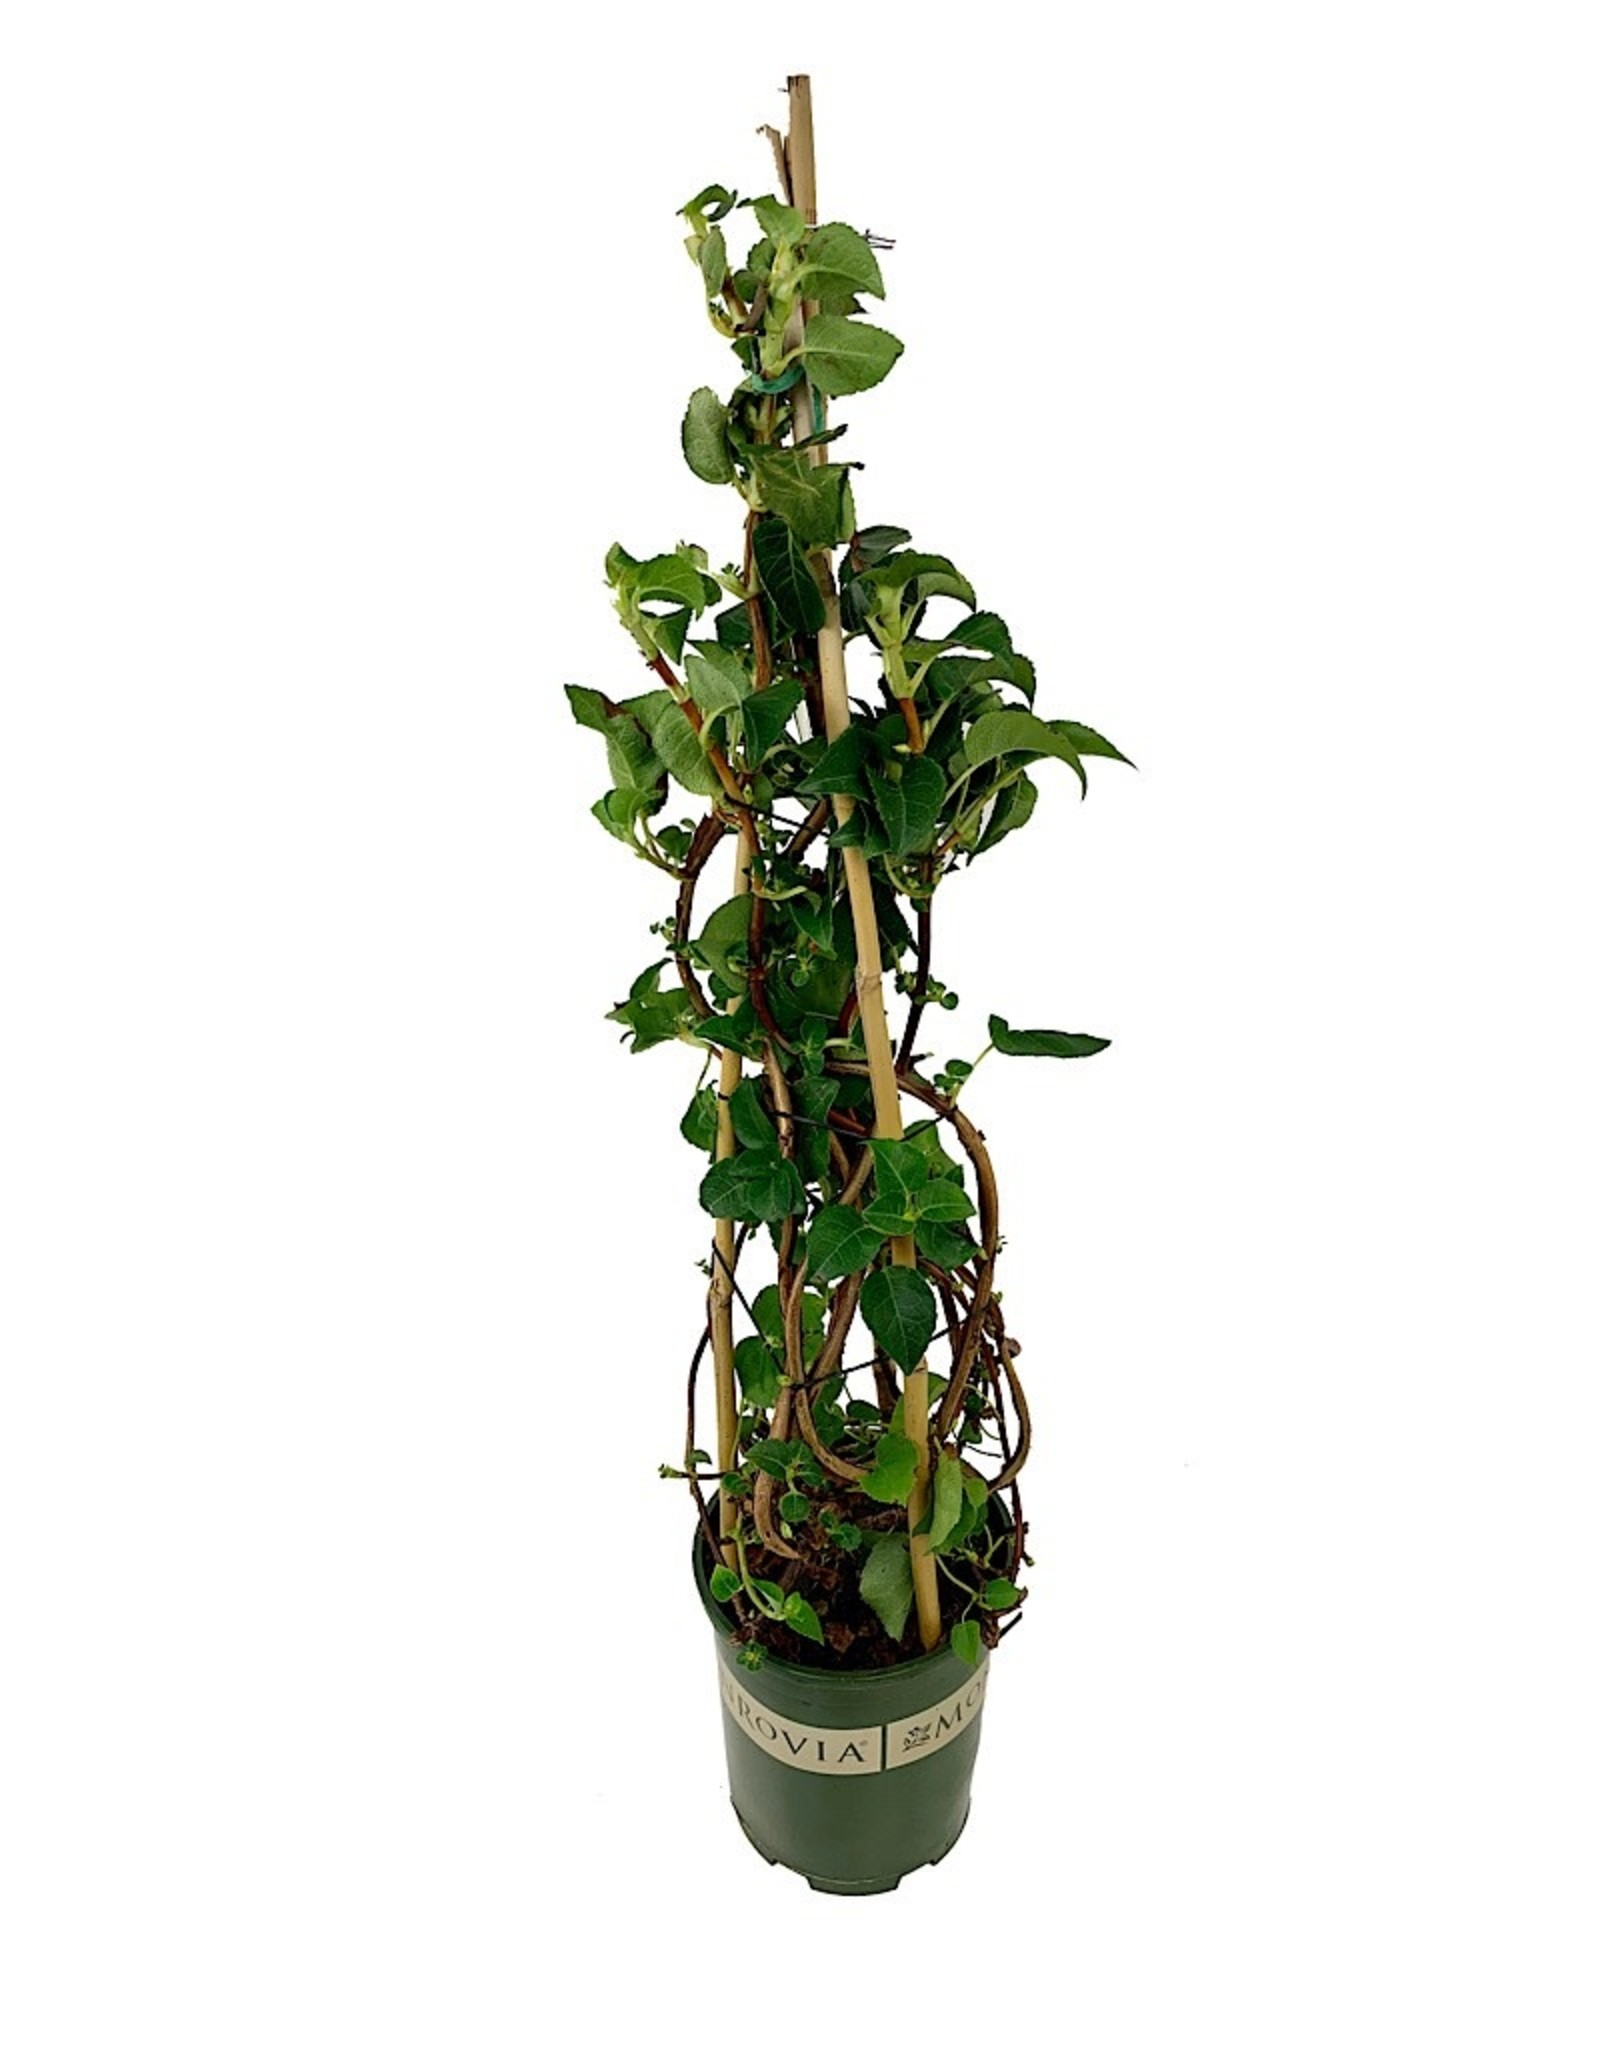 Hydrangea anomala petiolaris 1 Gallon